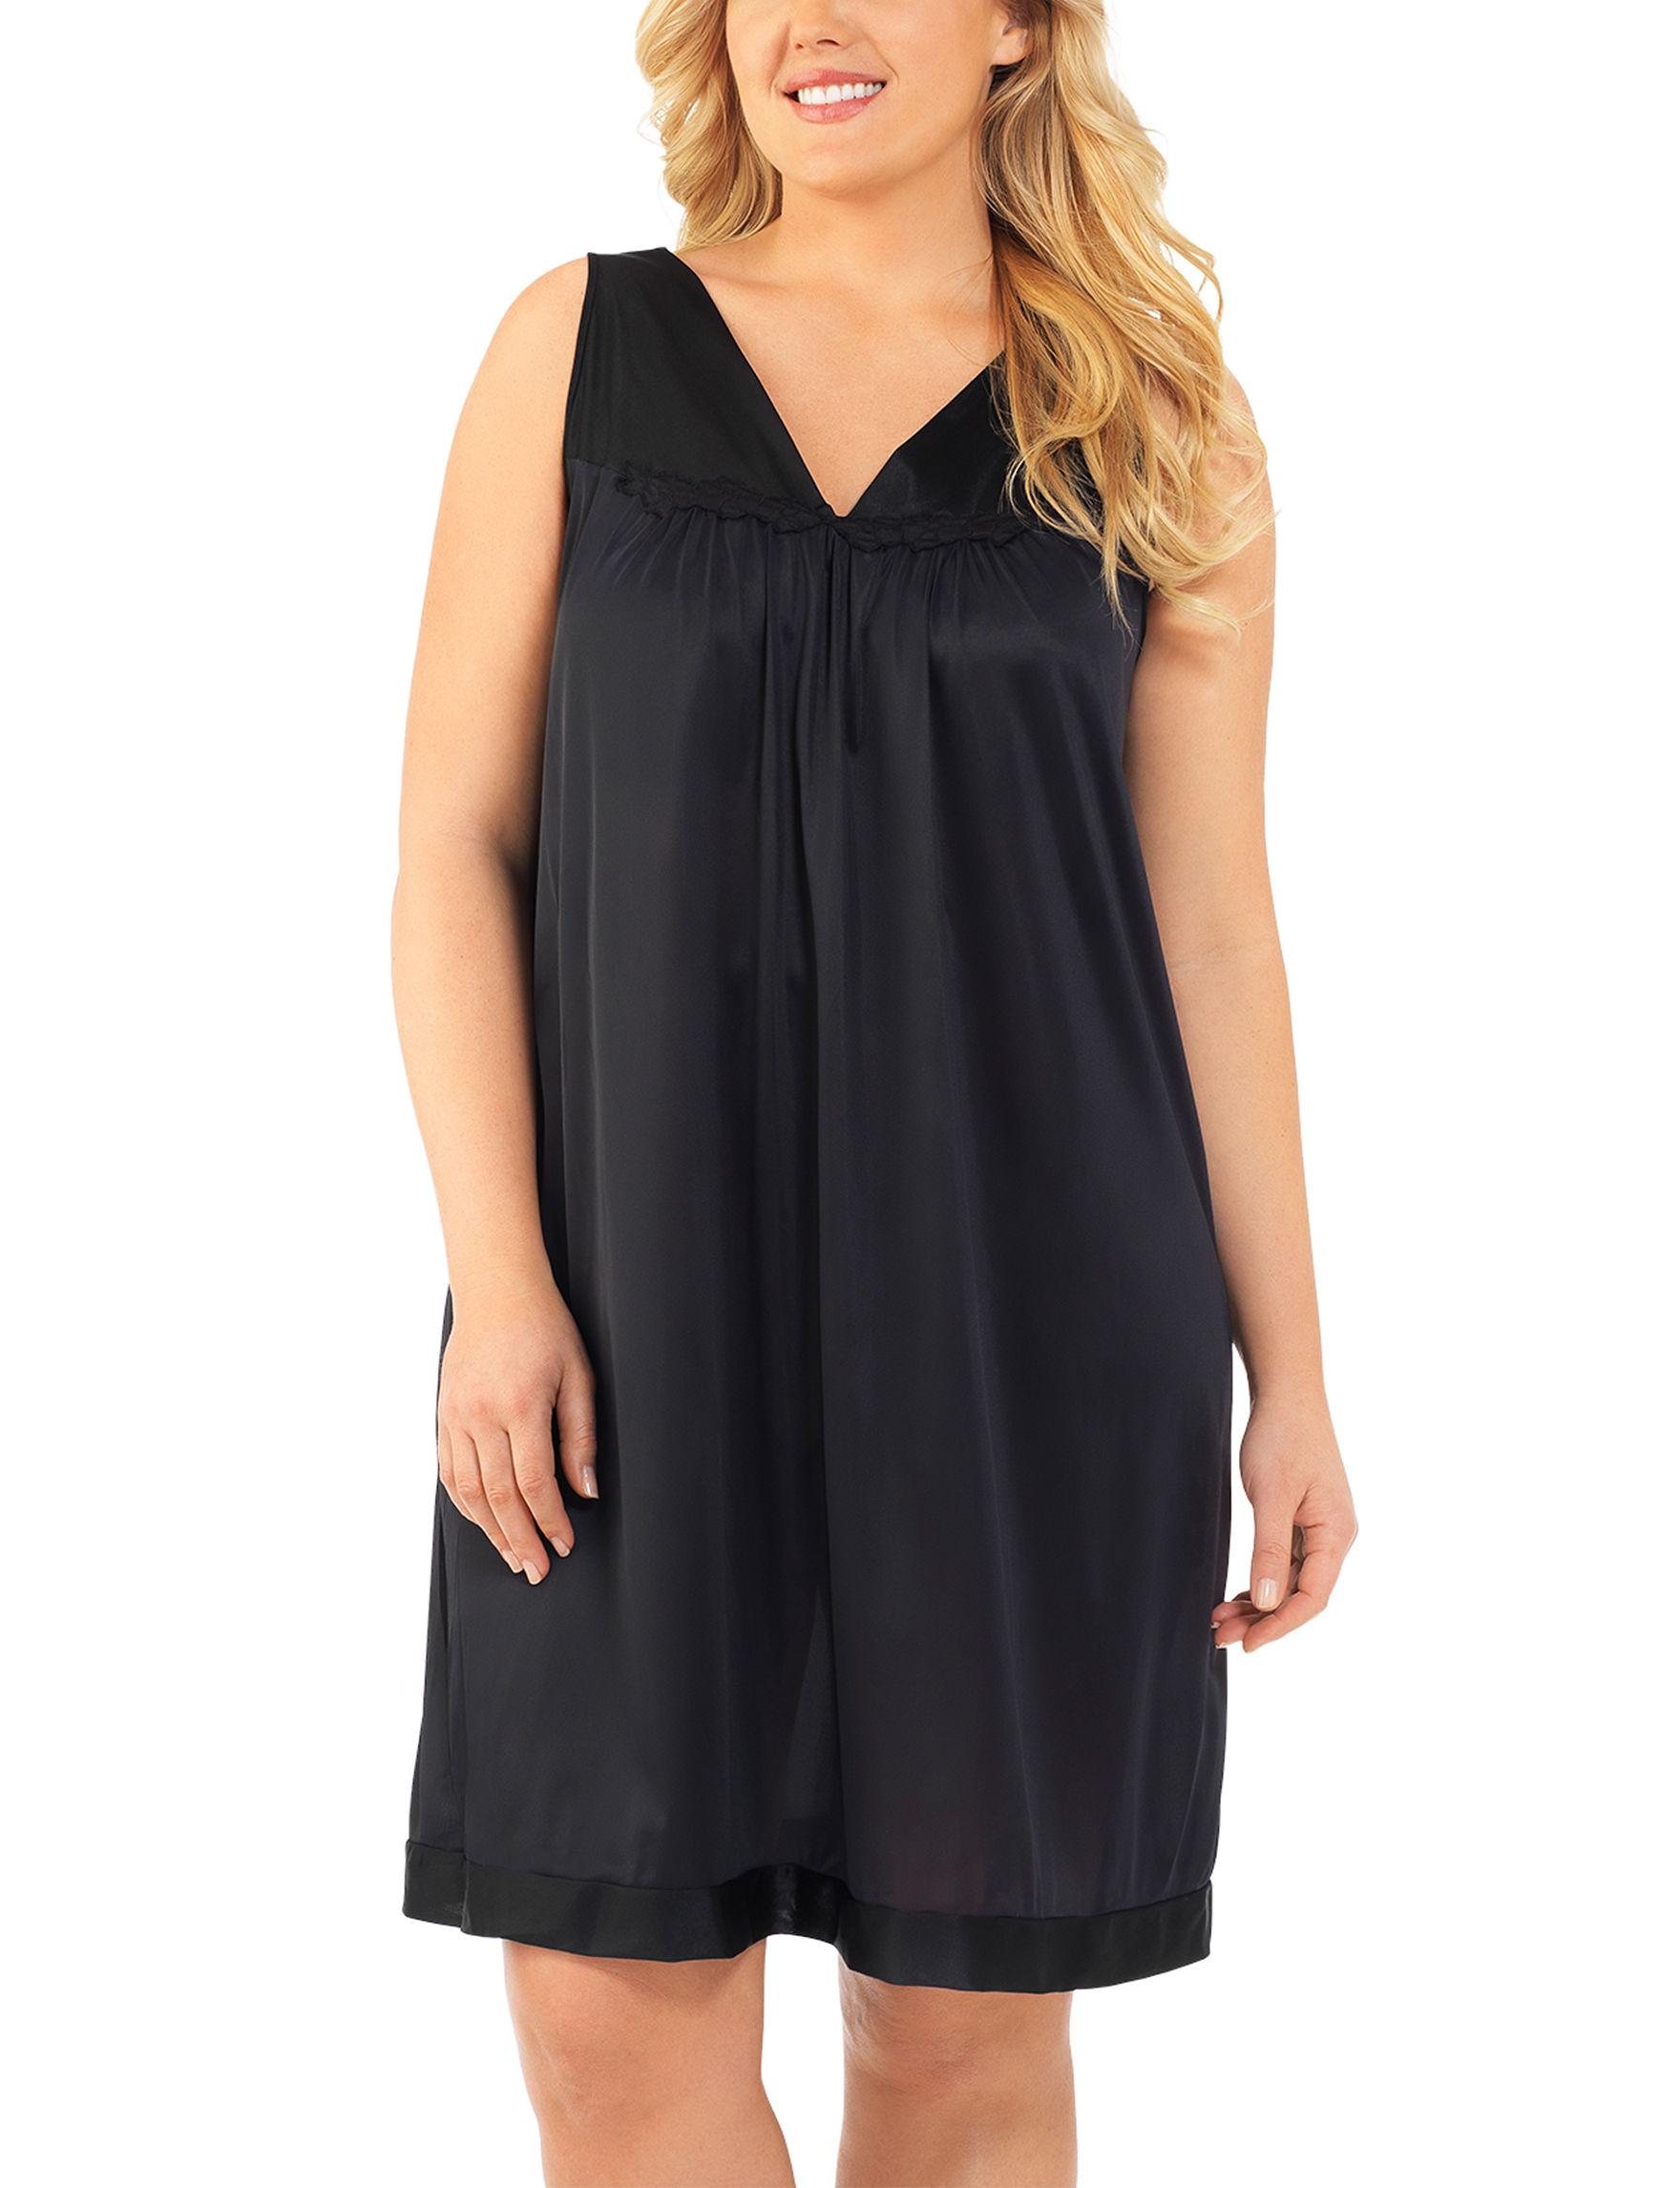 Exquisite Form Midnight Black Nightgowns & Sleep Shirts